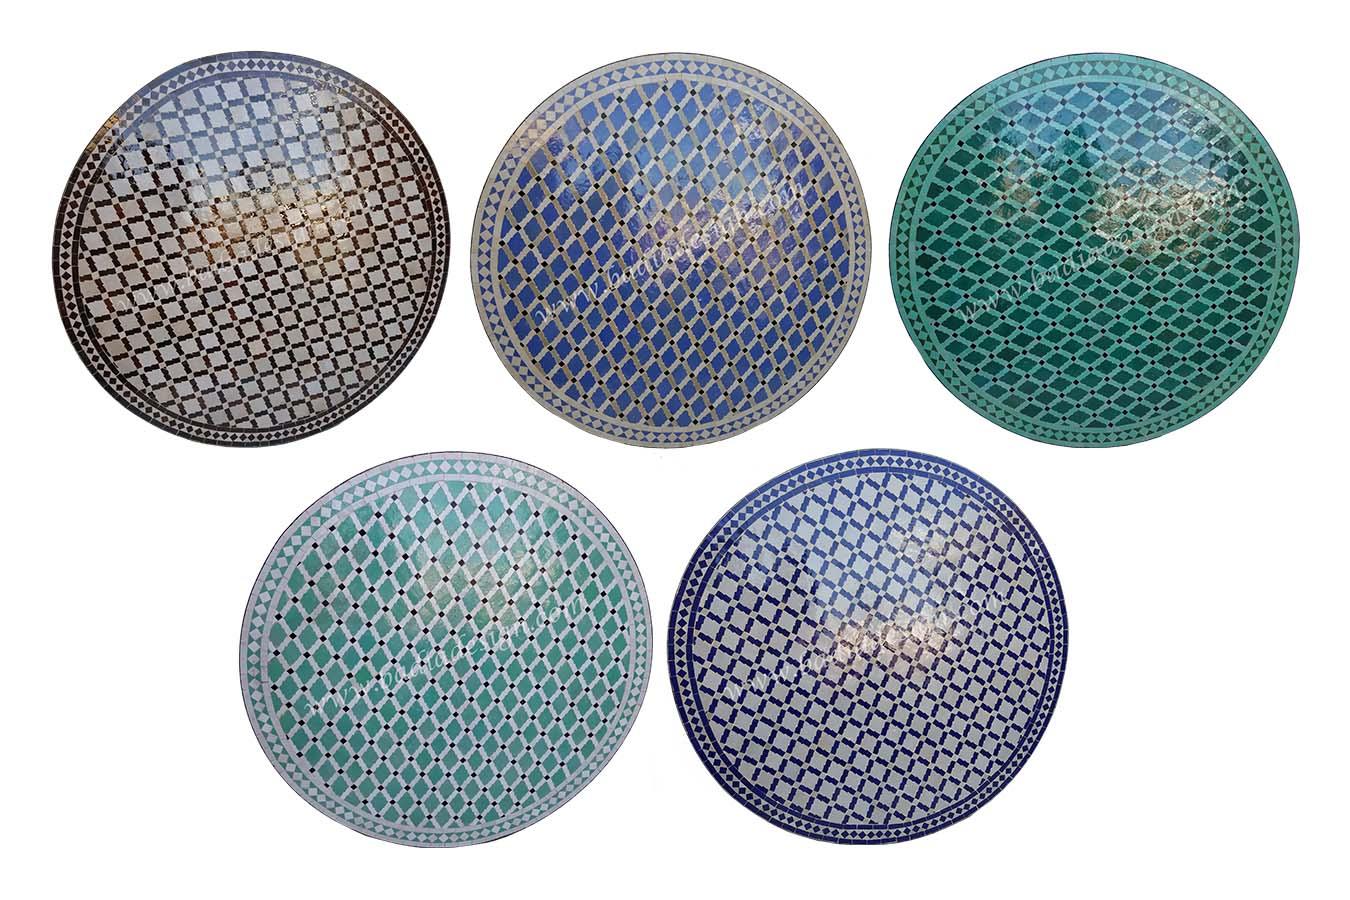 spanish-style-tile-table-top-mtr420.jpg